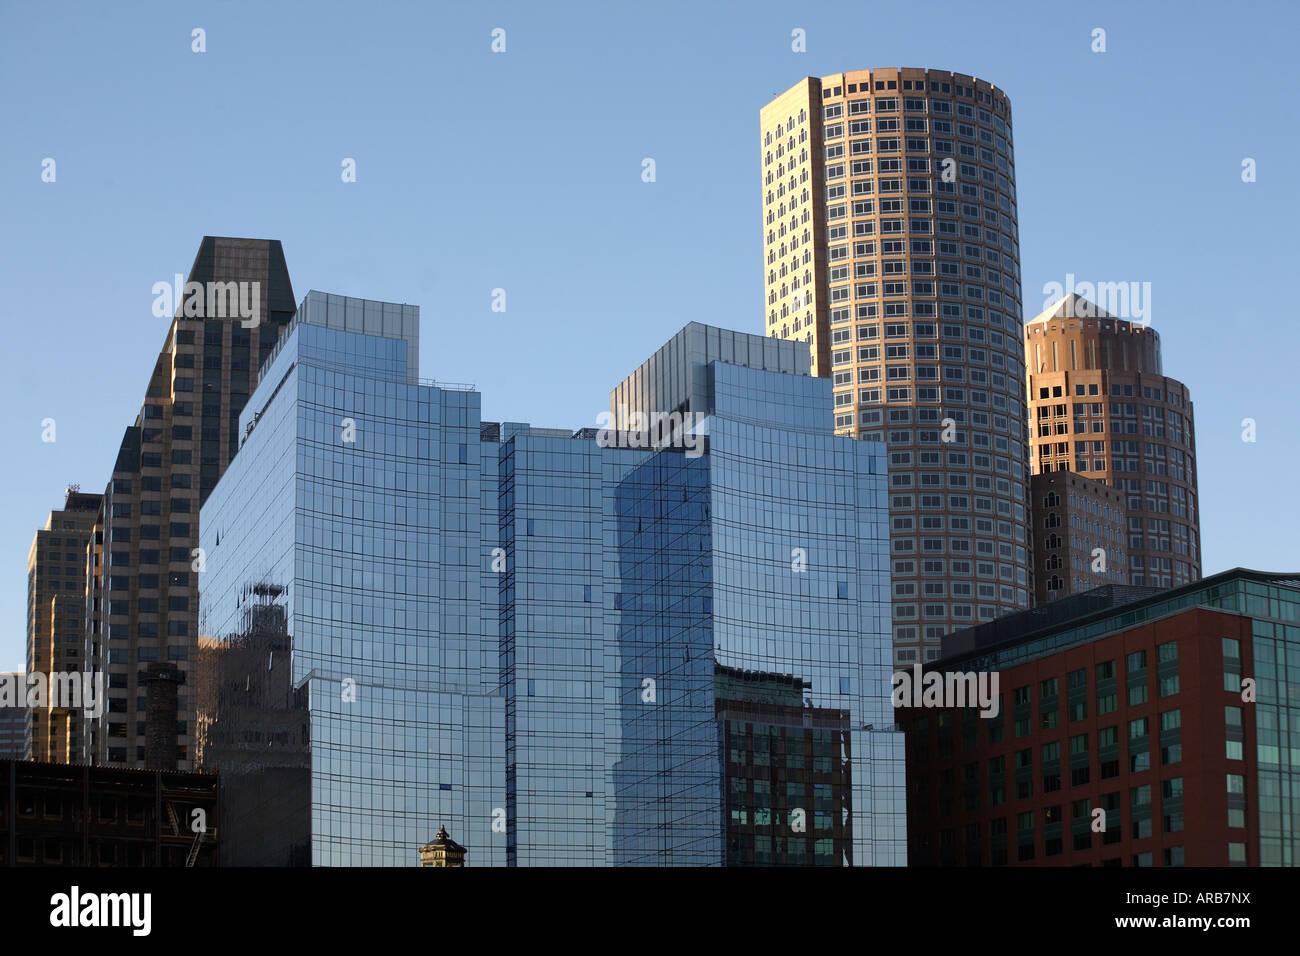 Skyscrapers. Boston, Massachusetts, USA - Stock Image